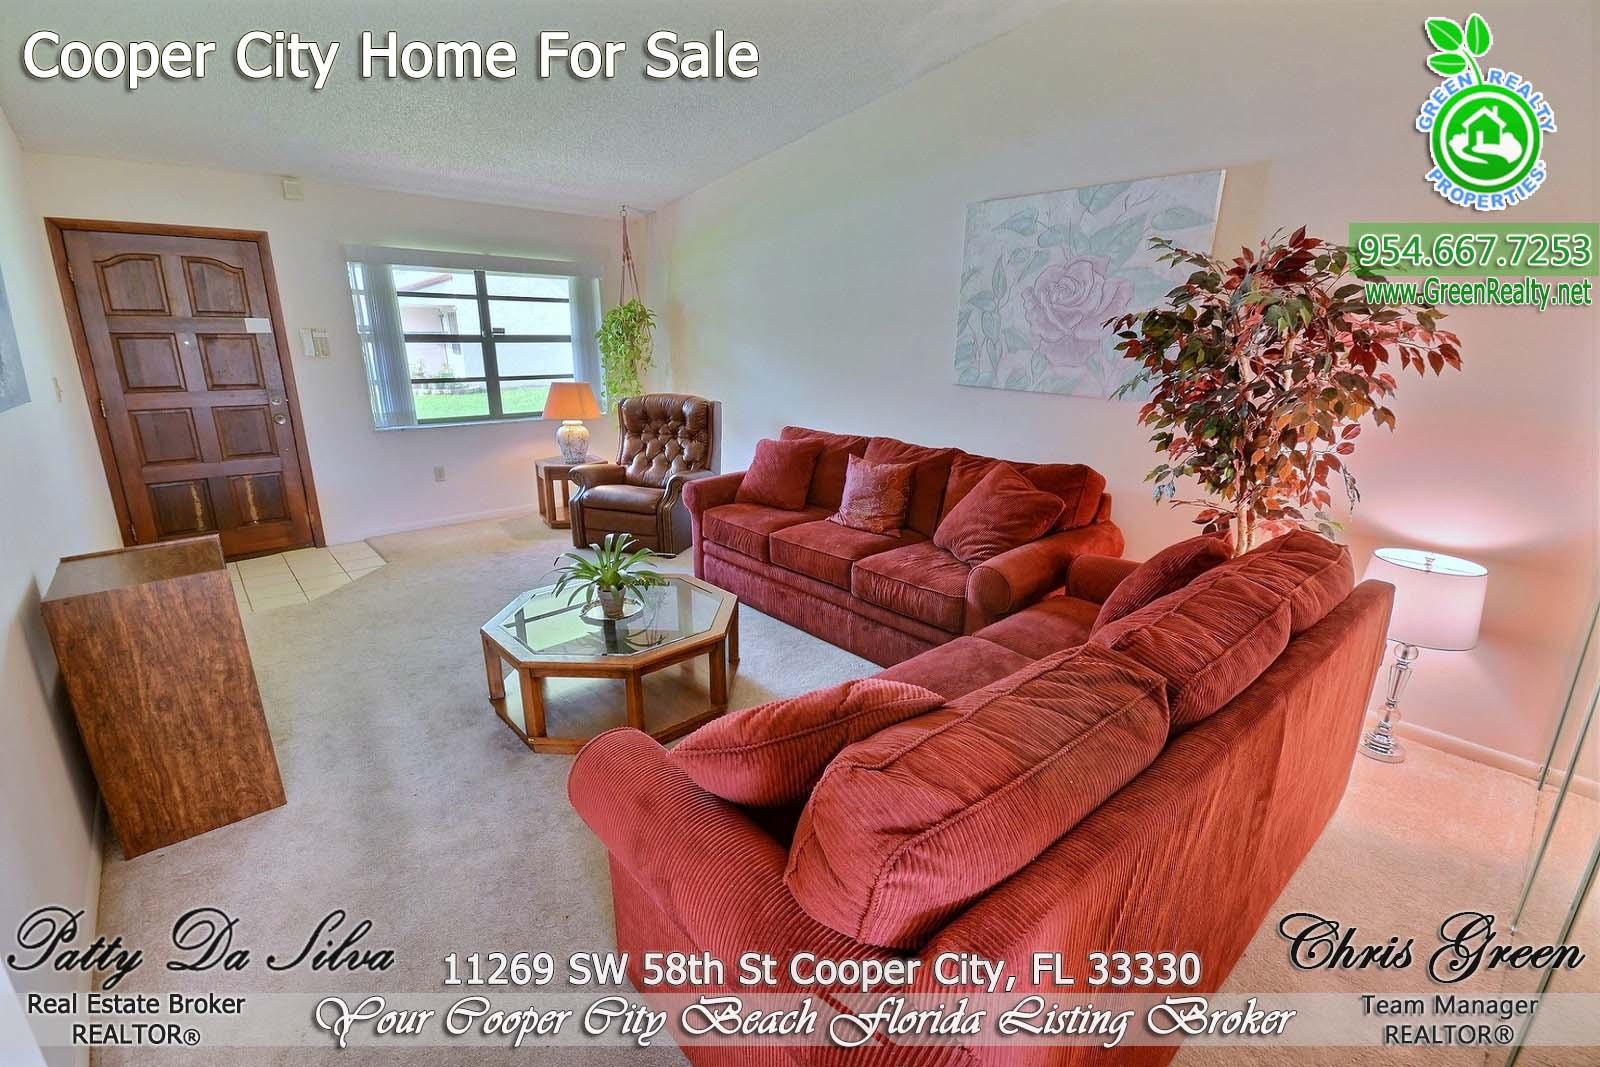 5 Cooper City Real Estate - Villas (10)